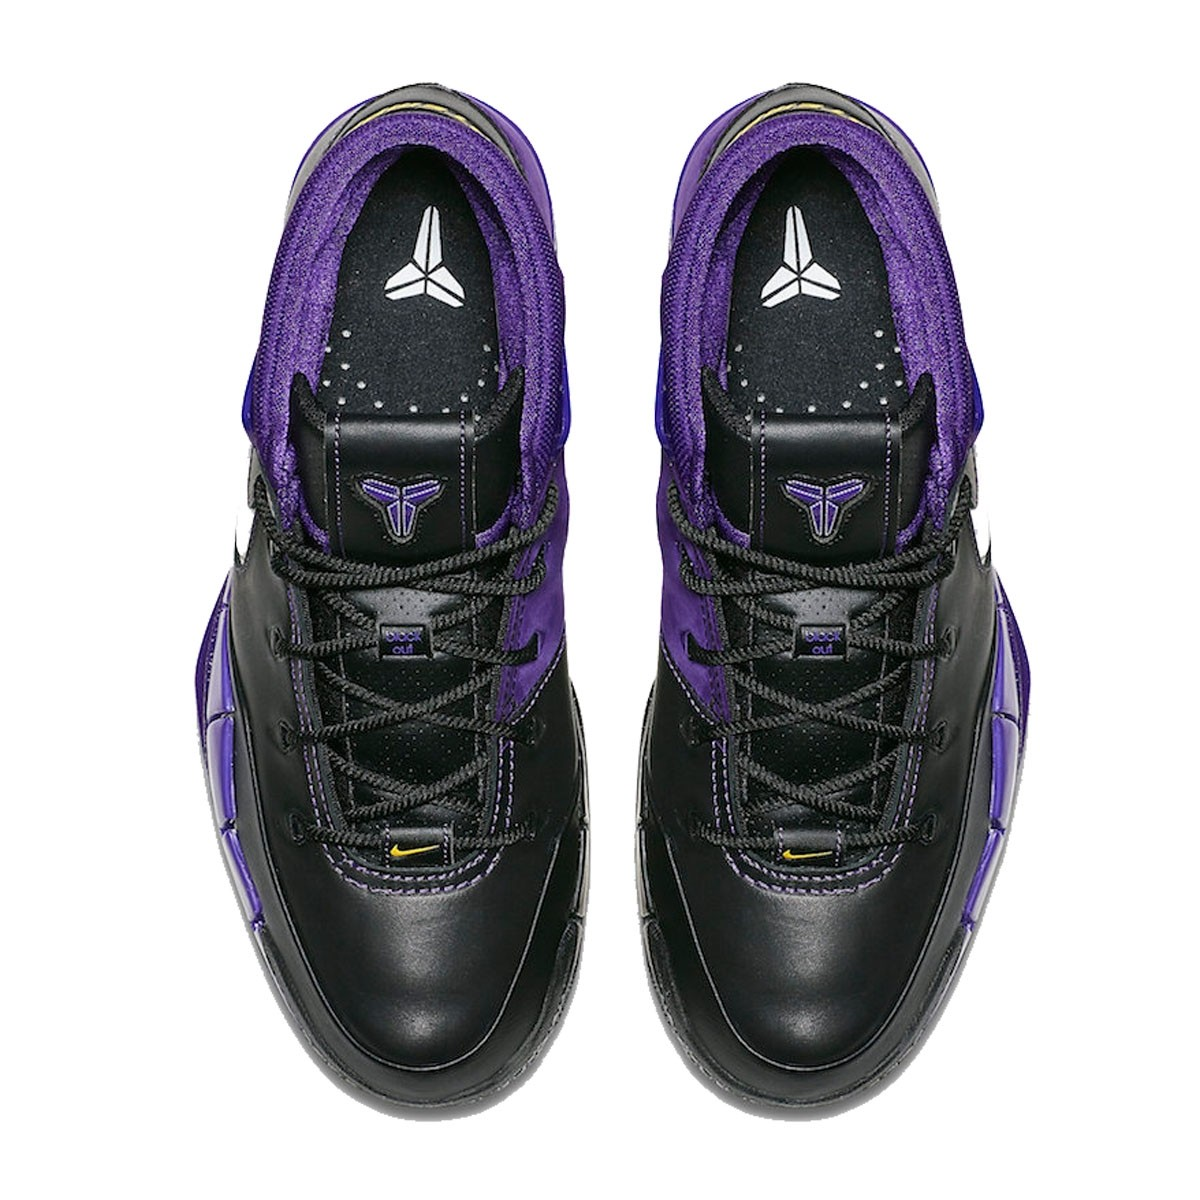 Nike Kobe 1 Protro 'Purple Reign' AQ2728-004